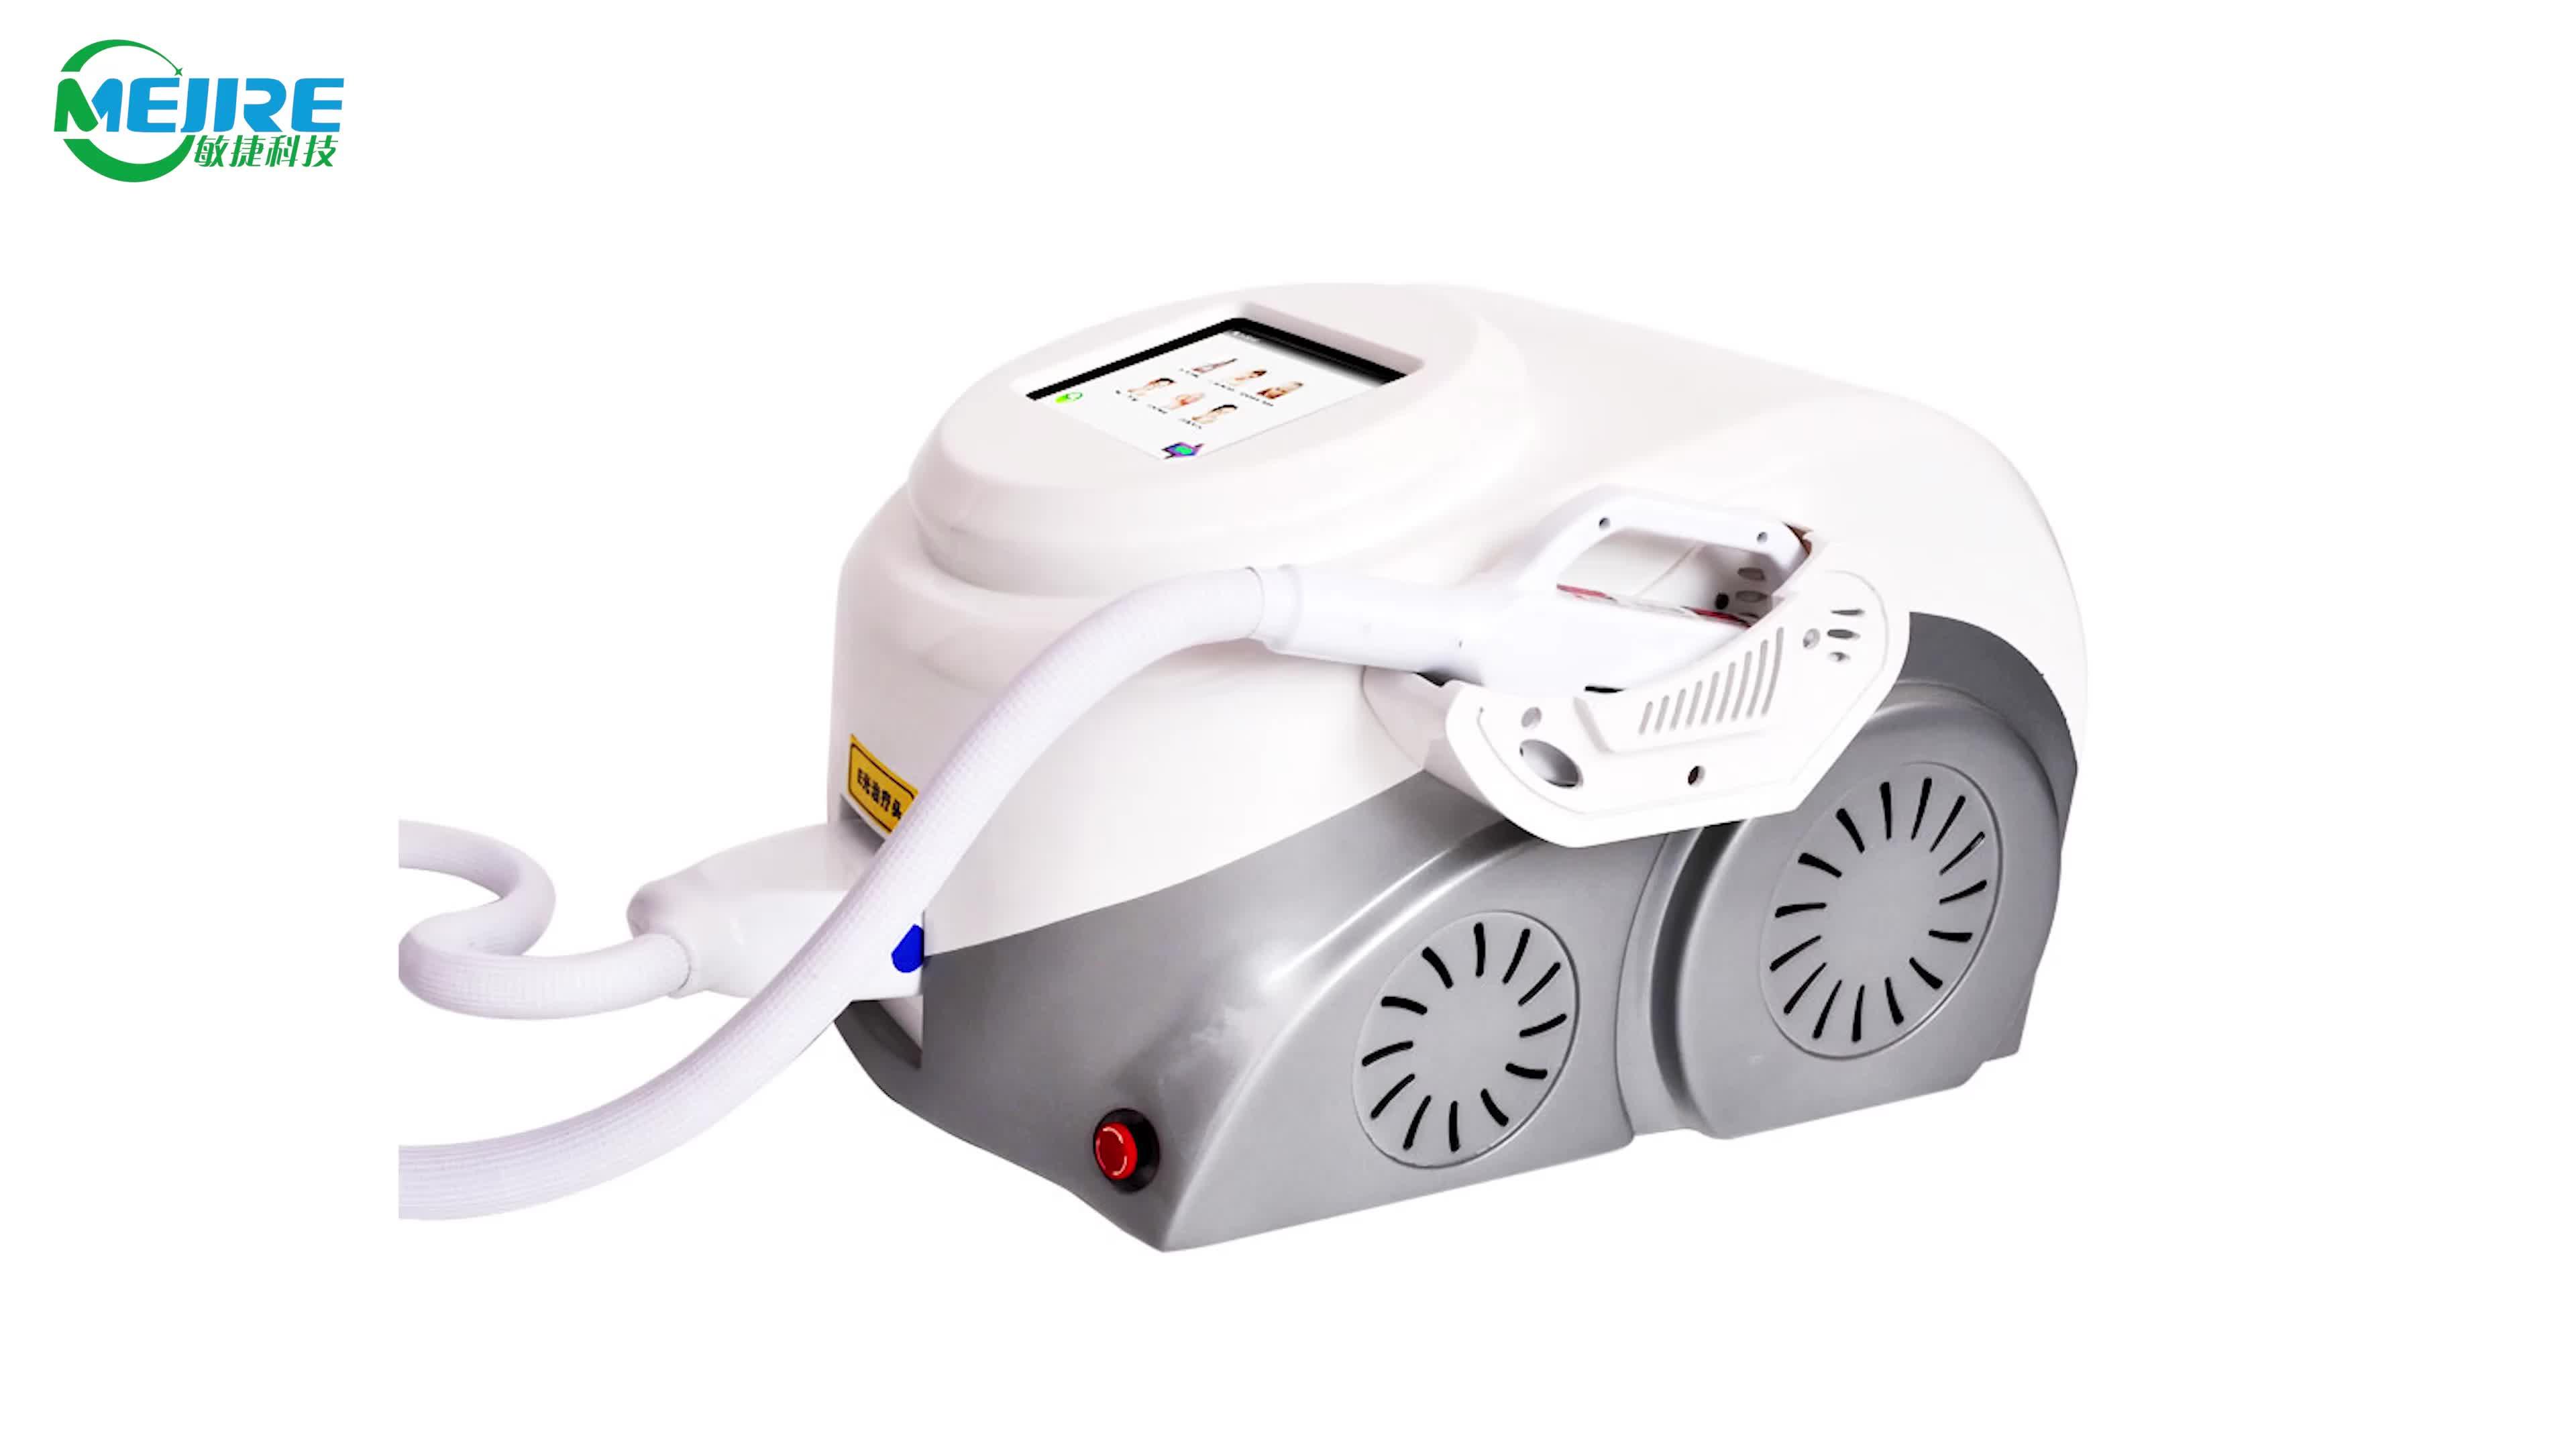 Portable Single Treatment Handles IPL SHR Elight Hair Removal Machine